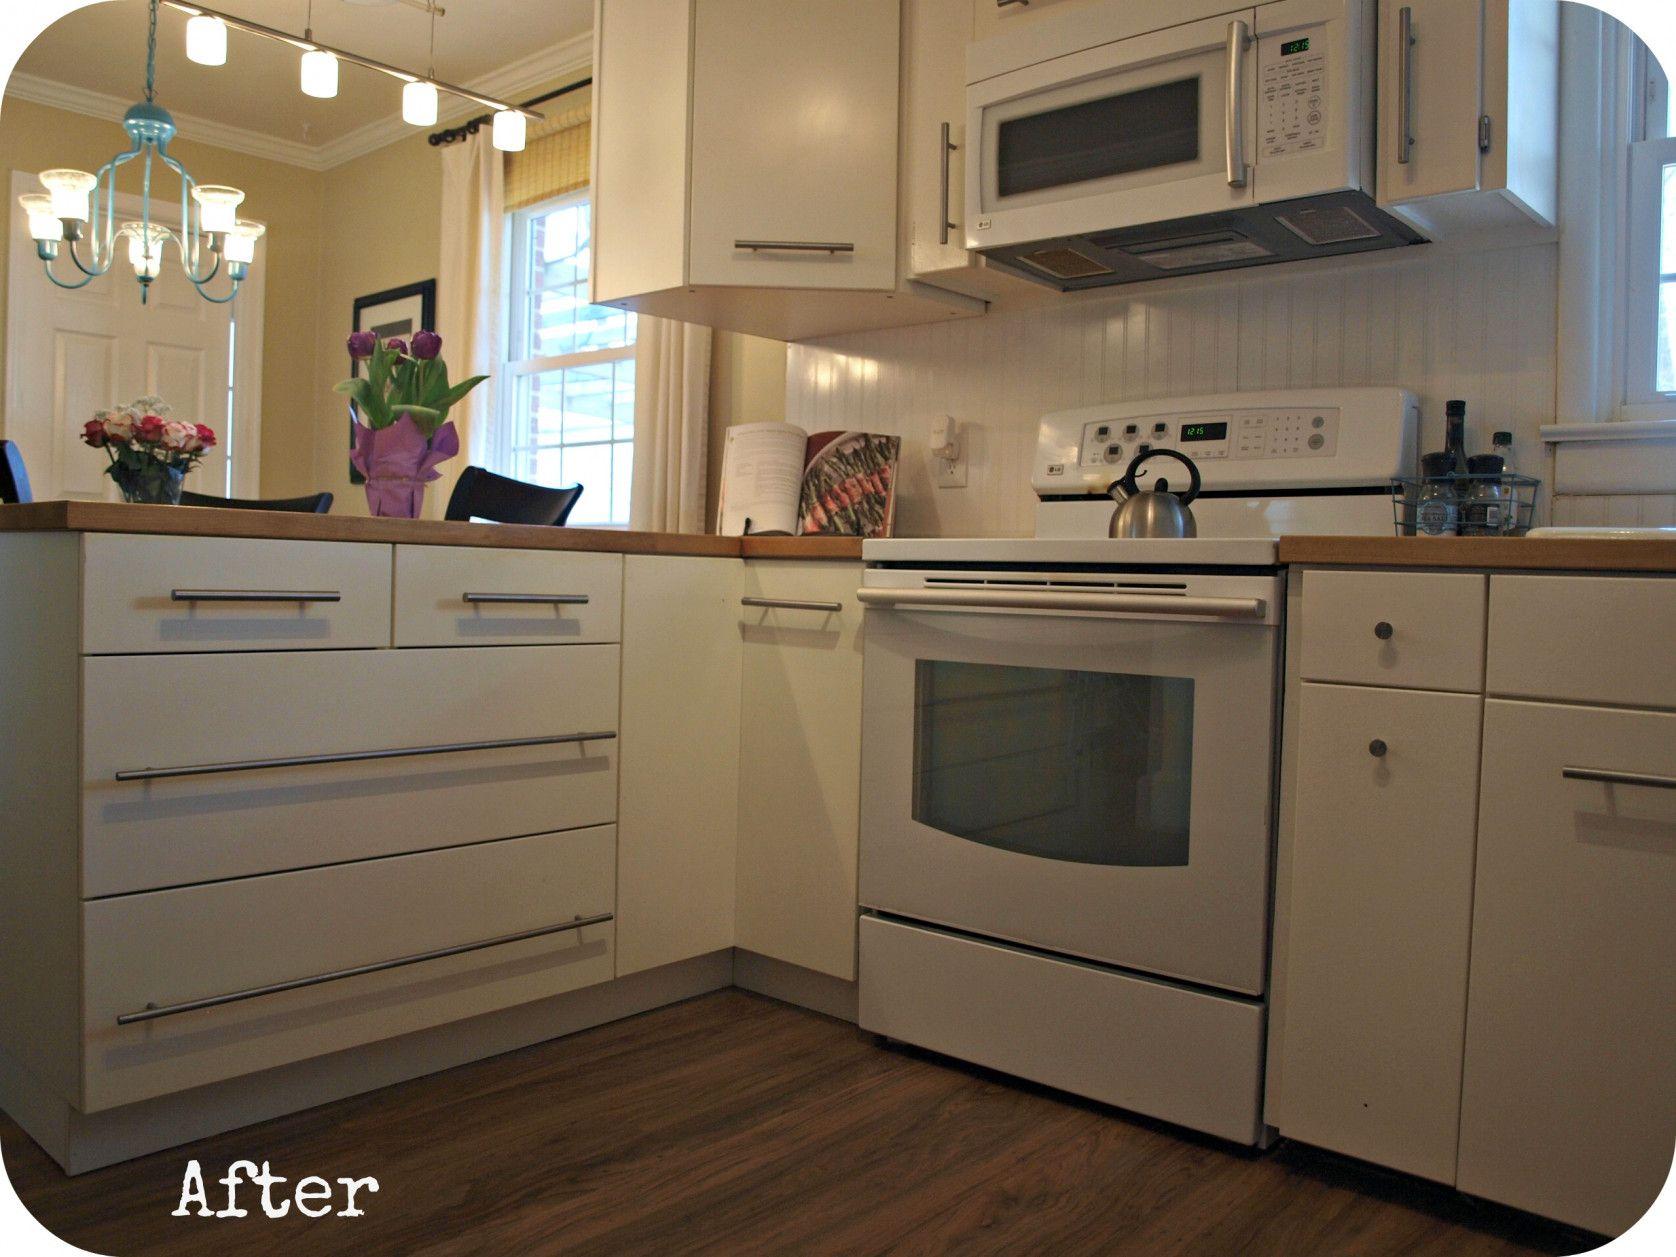 77 Ikea Kitchen Doors On Existing Cabinets Kitchen Decor Theme